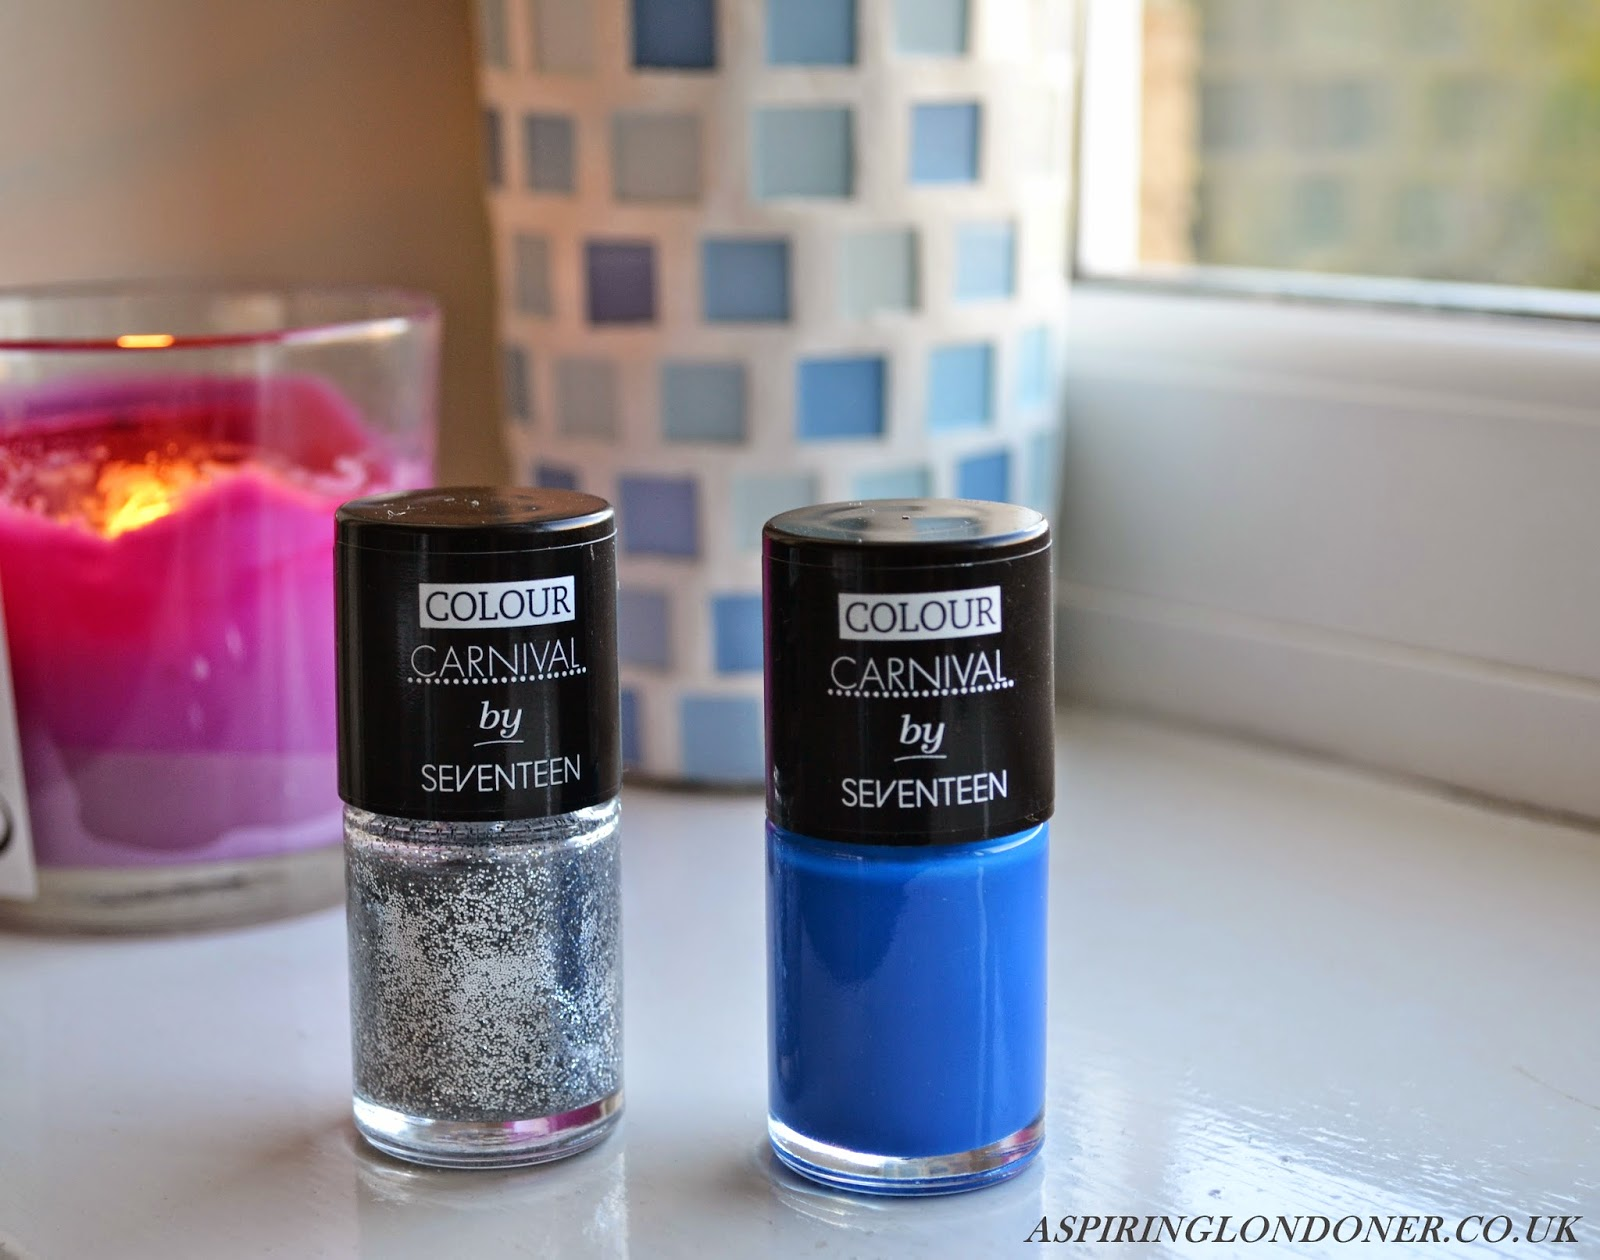 Seventeen Colour Carnival Nail Polish in Blue & Silver Glitter - Aspiring Londoner